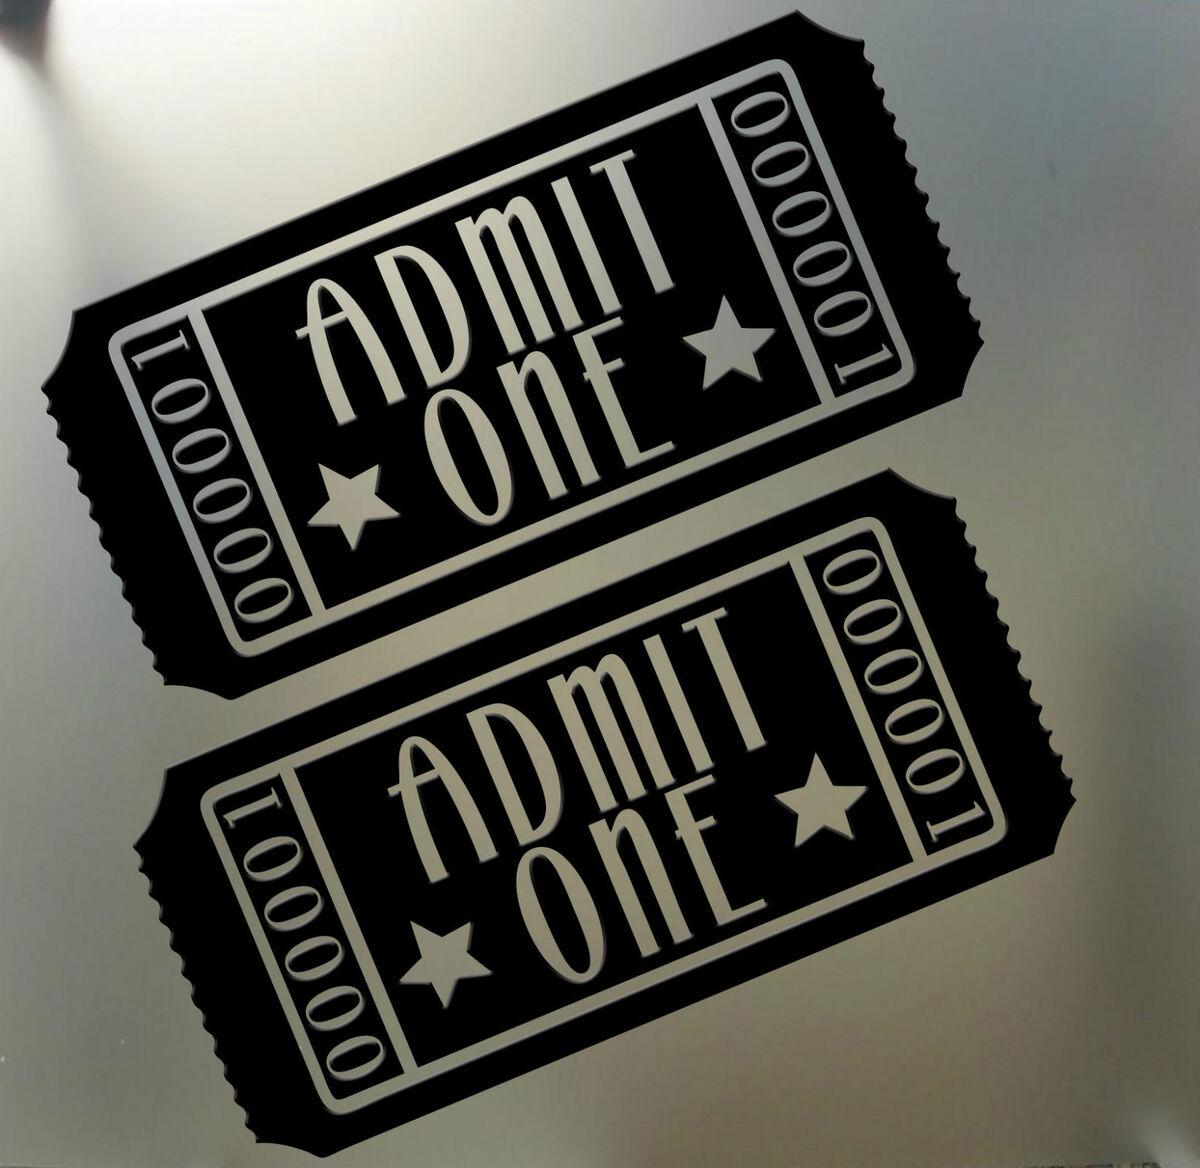 Home Theater Movie Tickets Admit One Vinyl Wall Art Decal Sticker